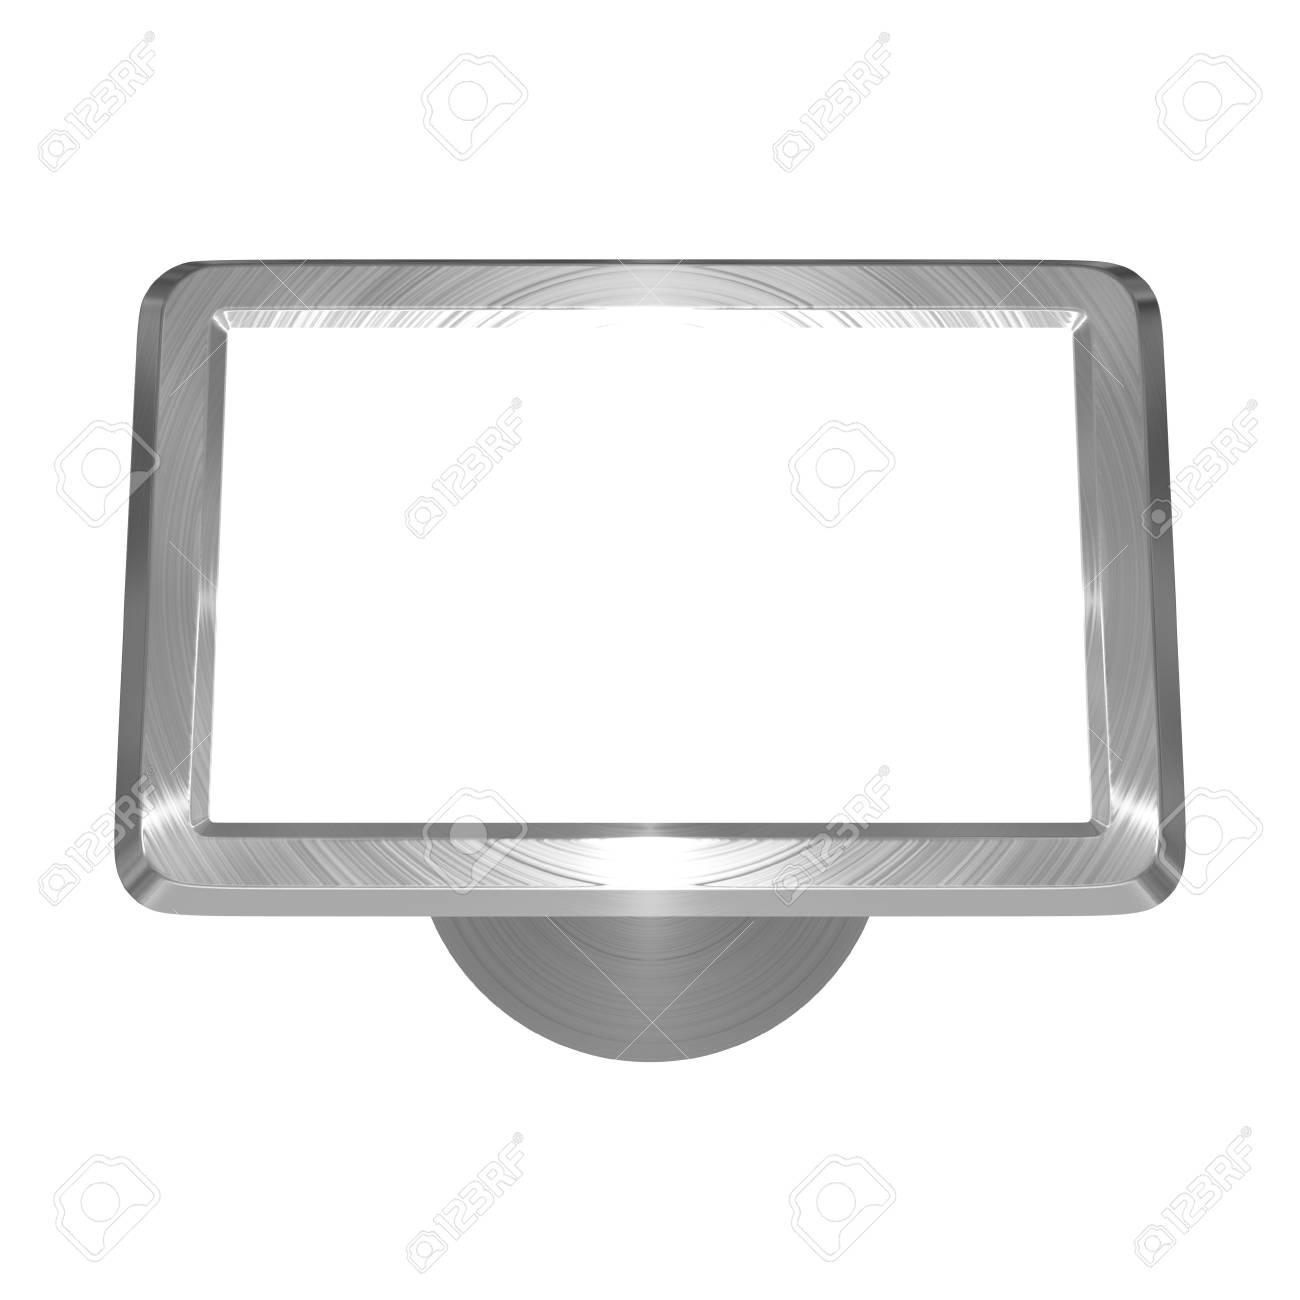 3D illustration of metallic, brushed steel effect satellite navigation on white background - 5875876